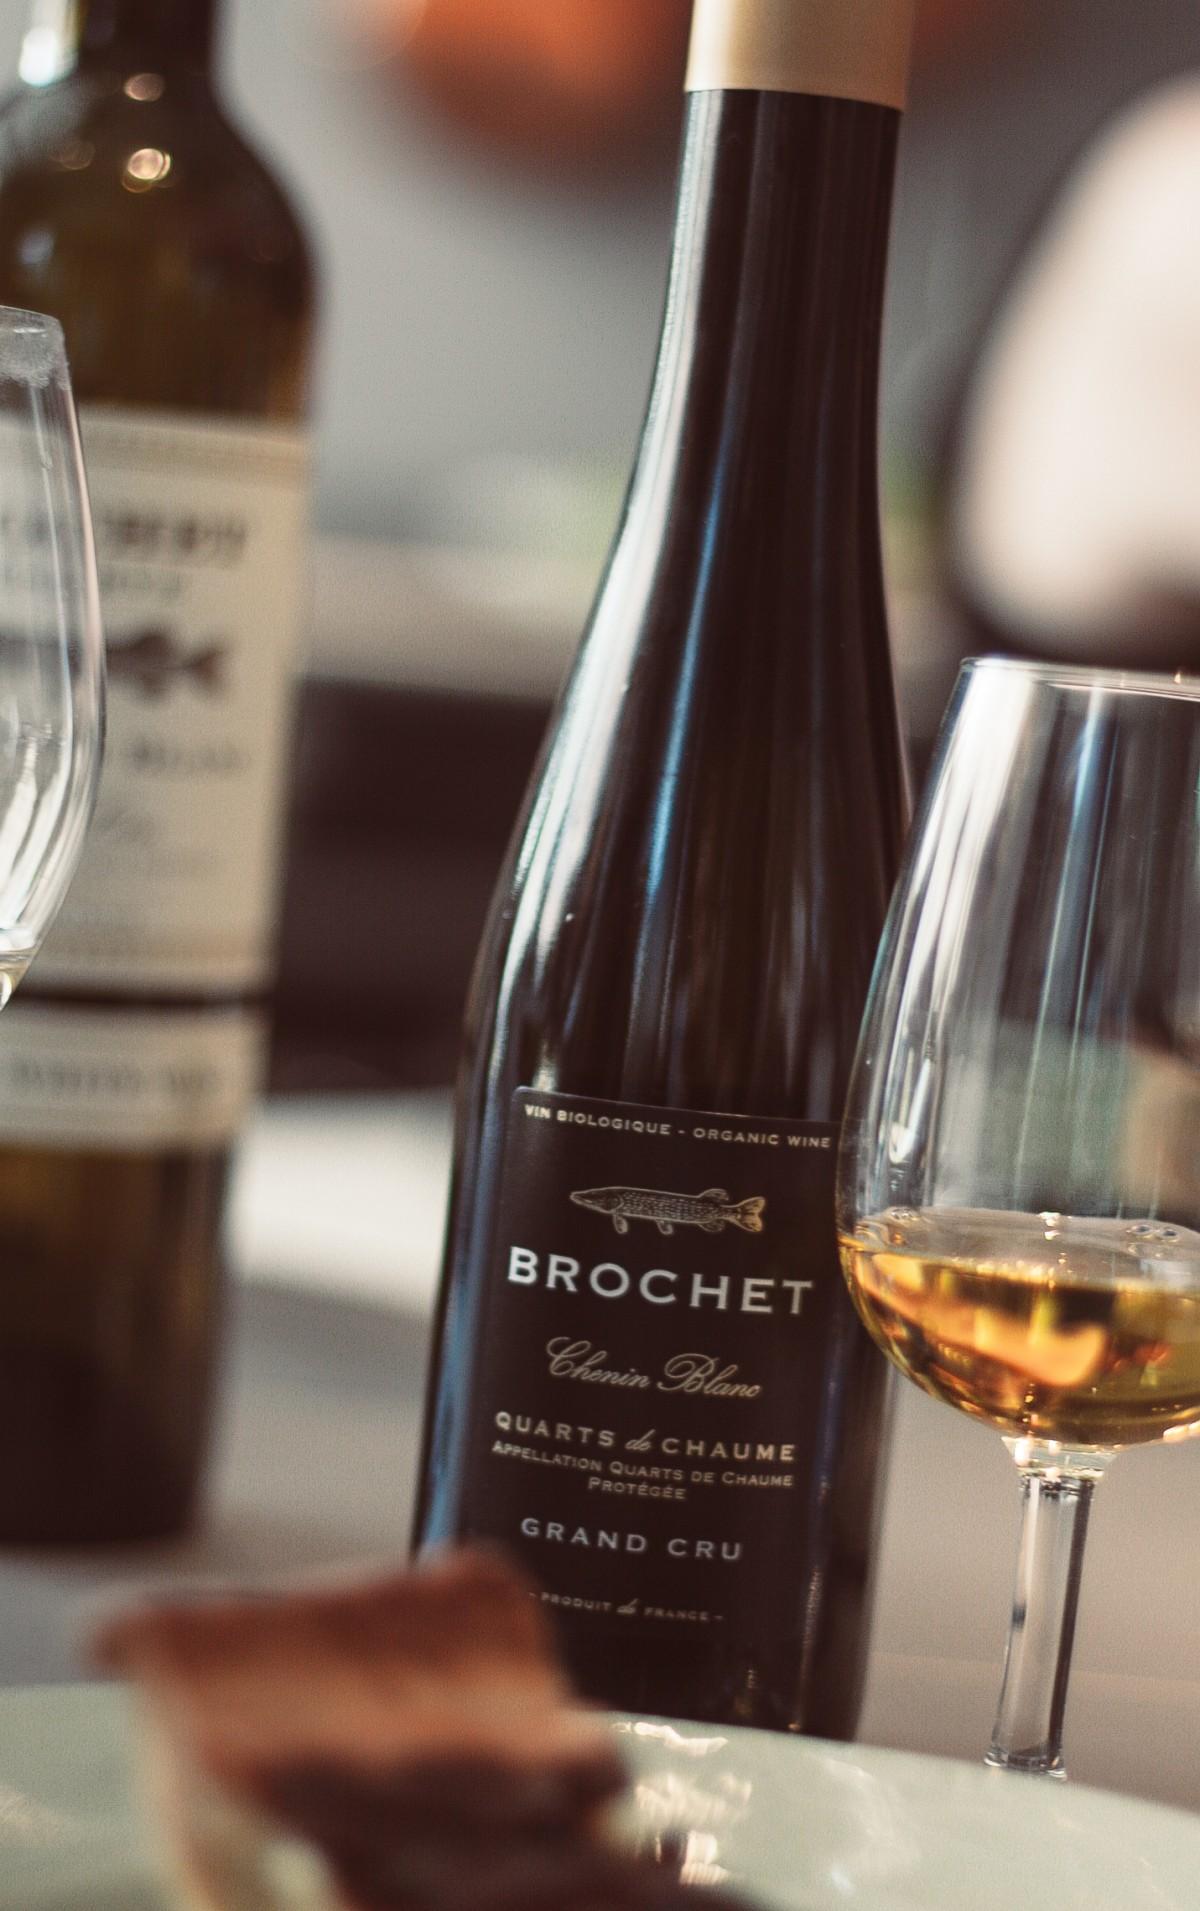 Sommarens dessertvin:  Brochet Quarts de Chaume Grand Cru 2015.